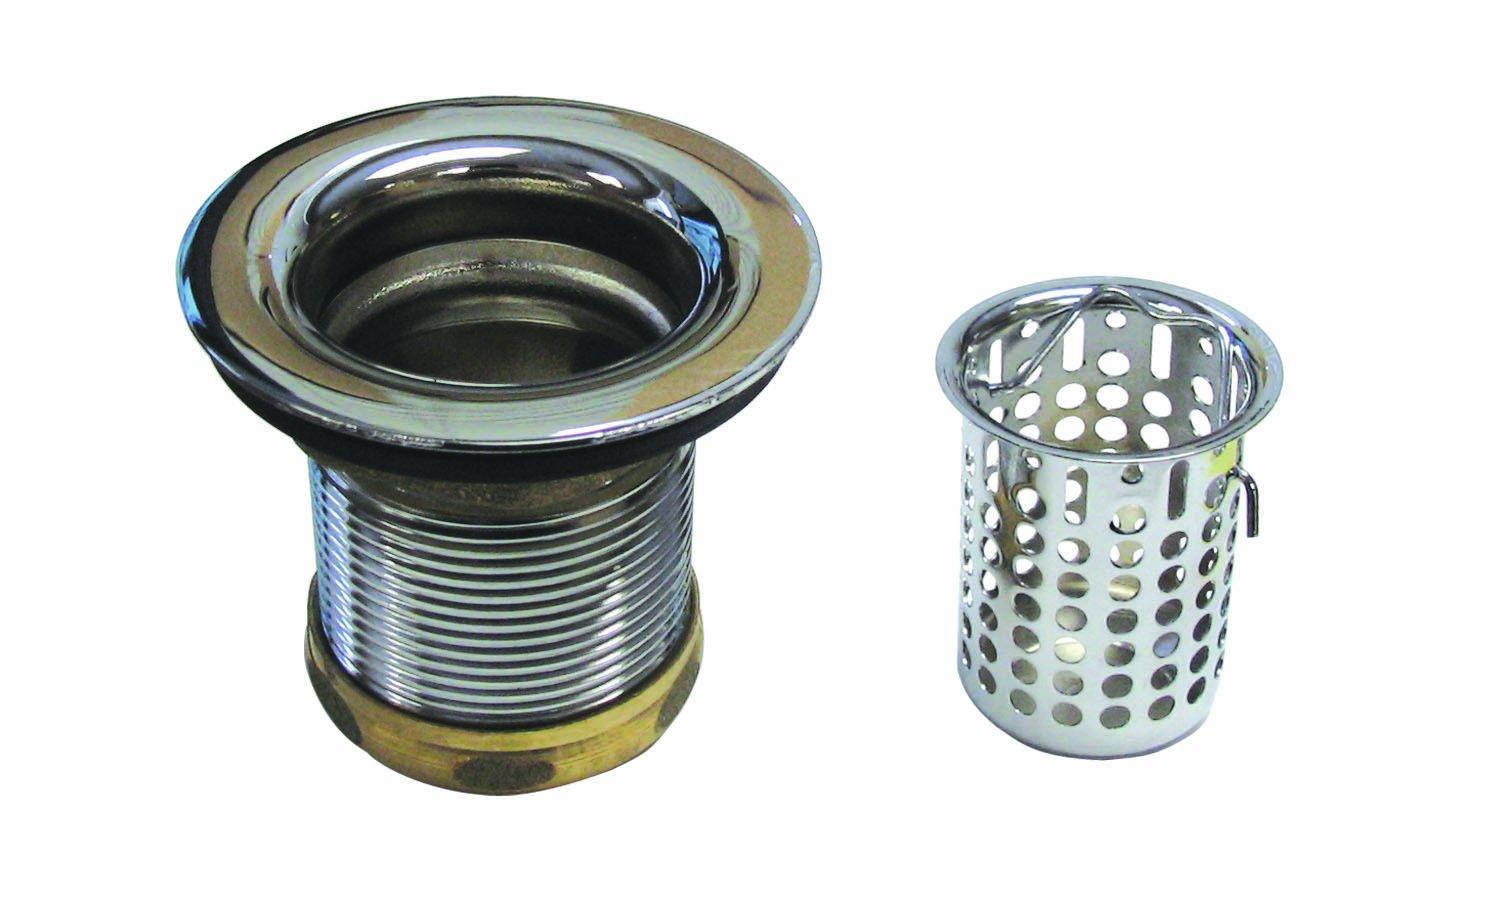 Westbrass D218 12 2 Inch Basket Sink Strainer Oil Rubbed Bronze Sink Strainers Amazon Com